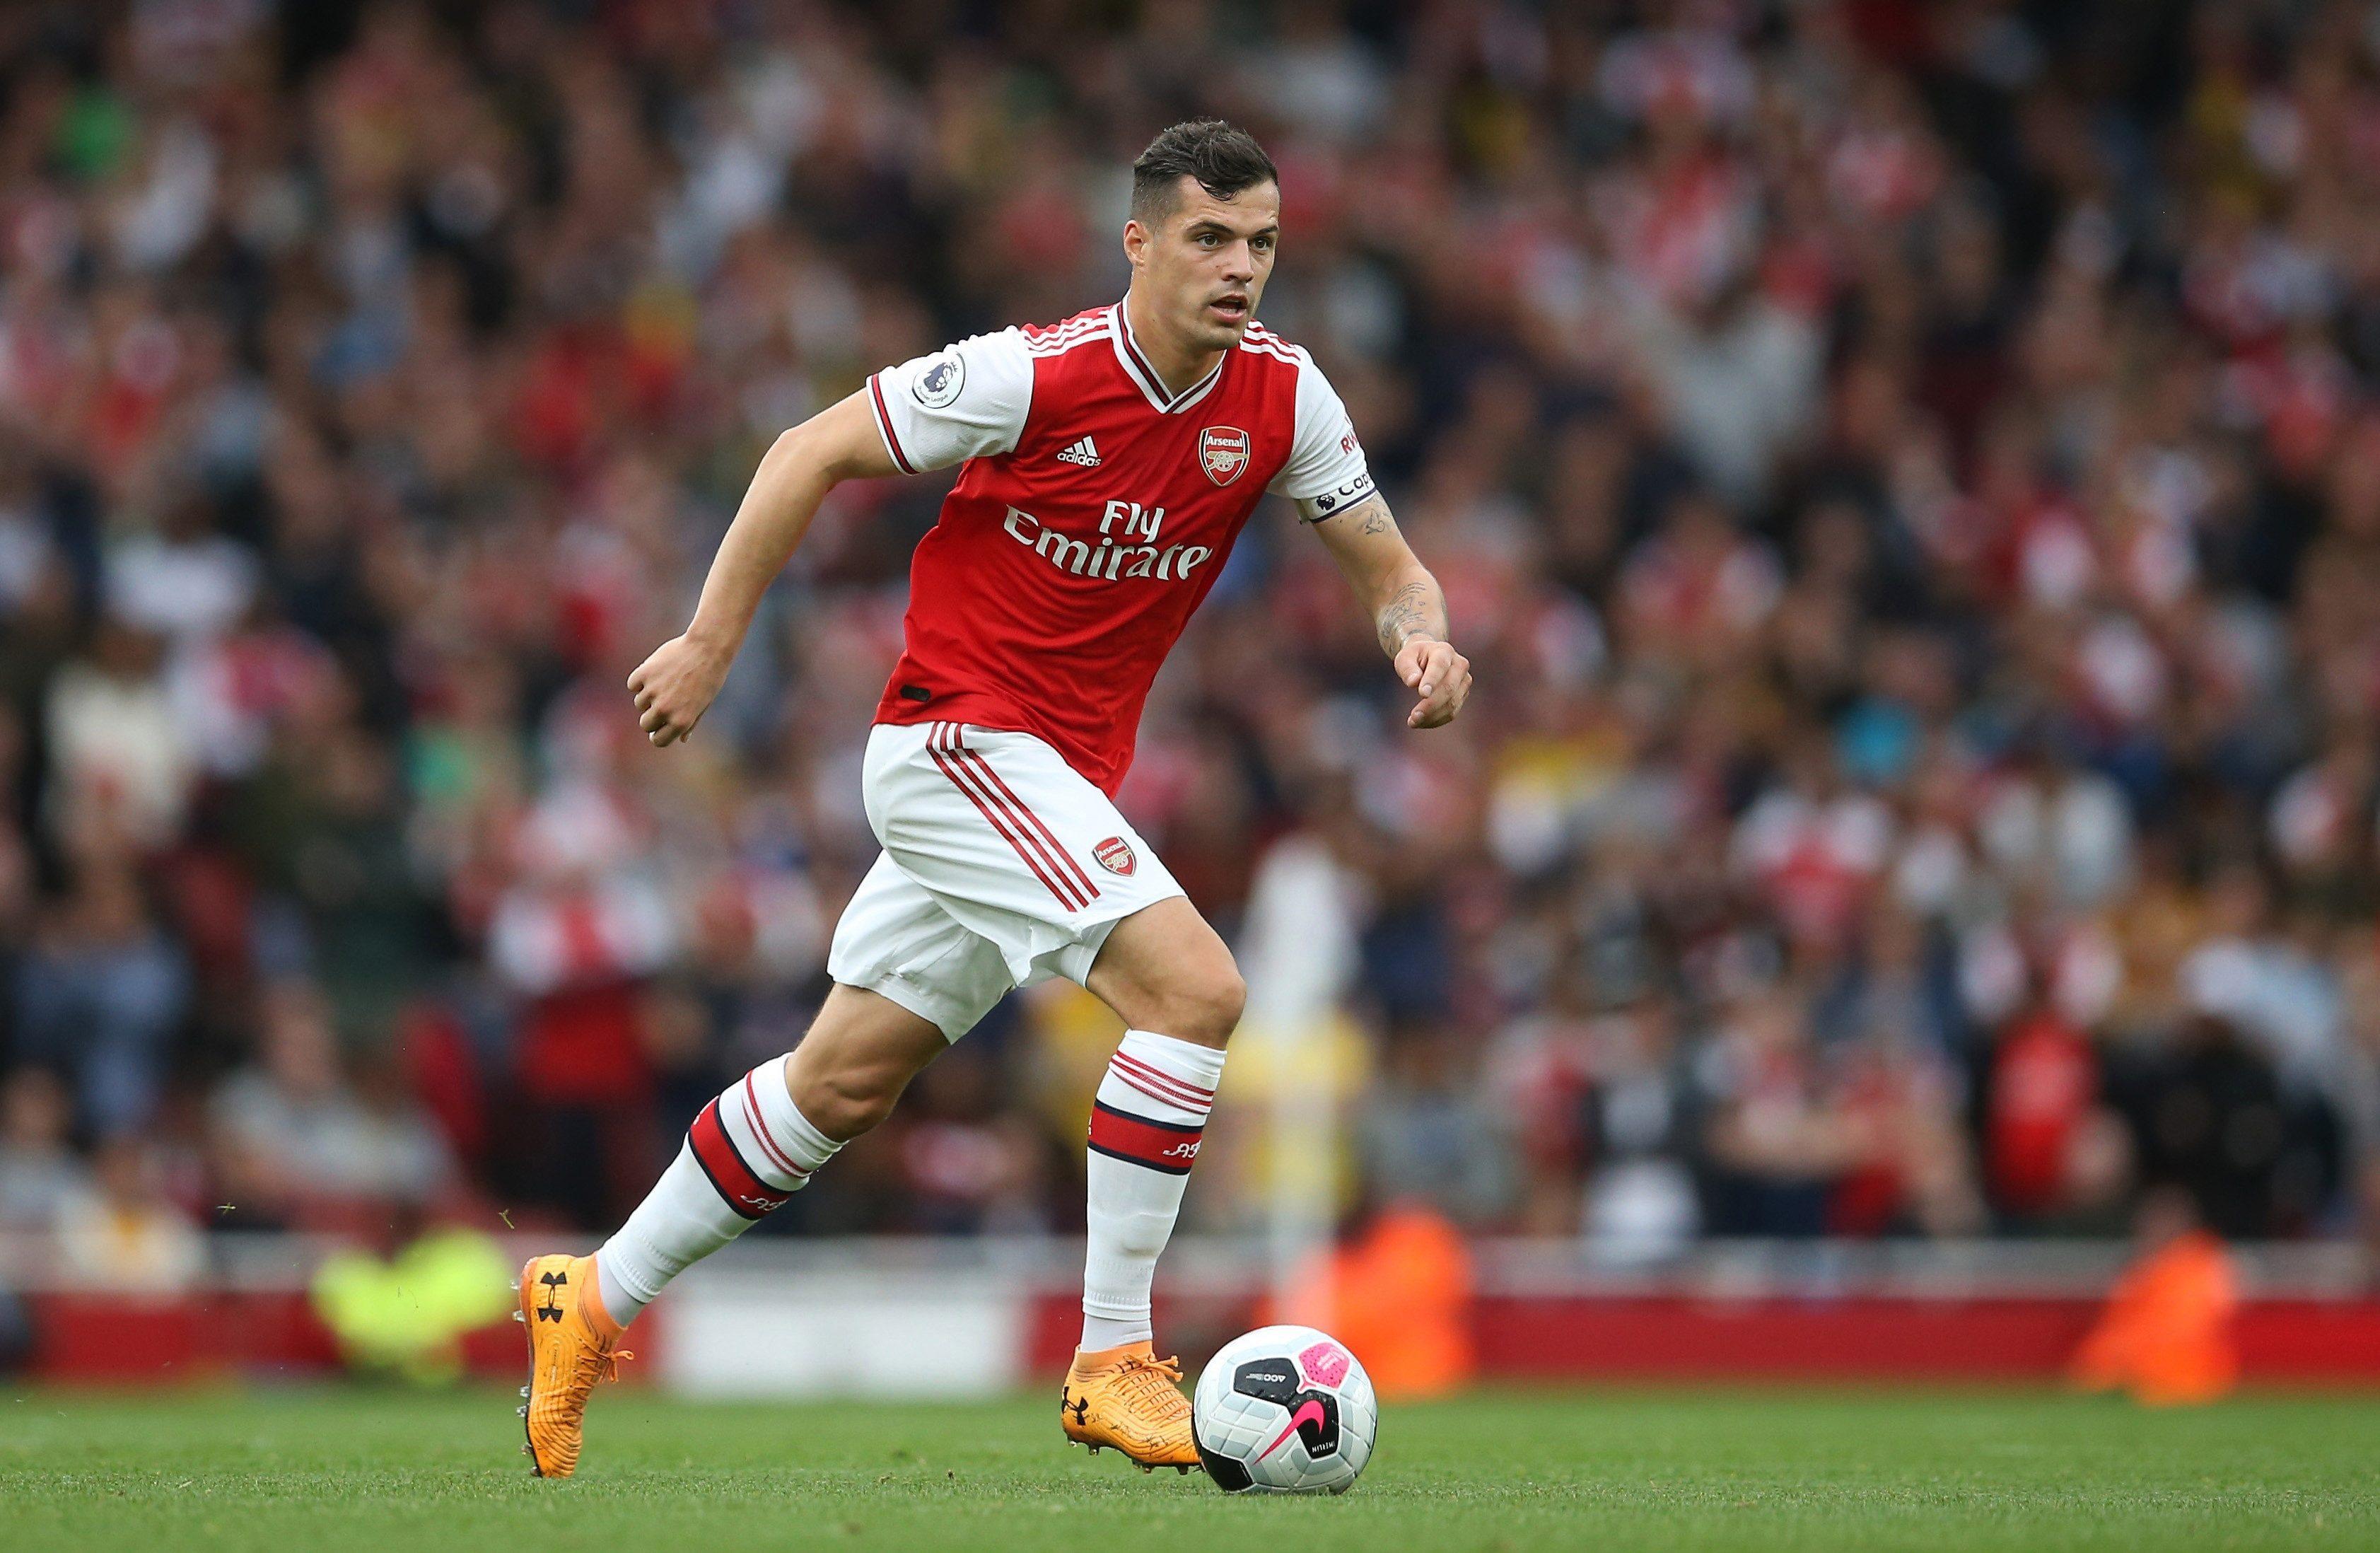 Arsenal midfielder Granit Xhaka is no stranger to a yellow card